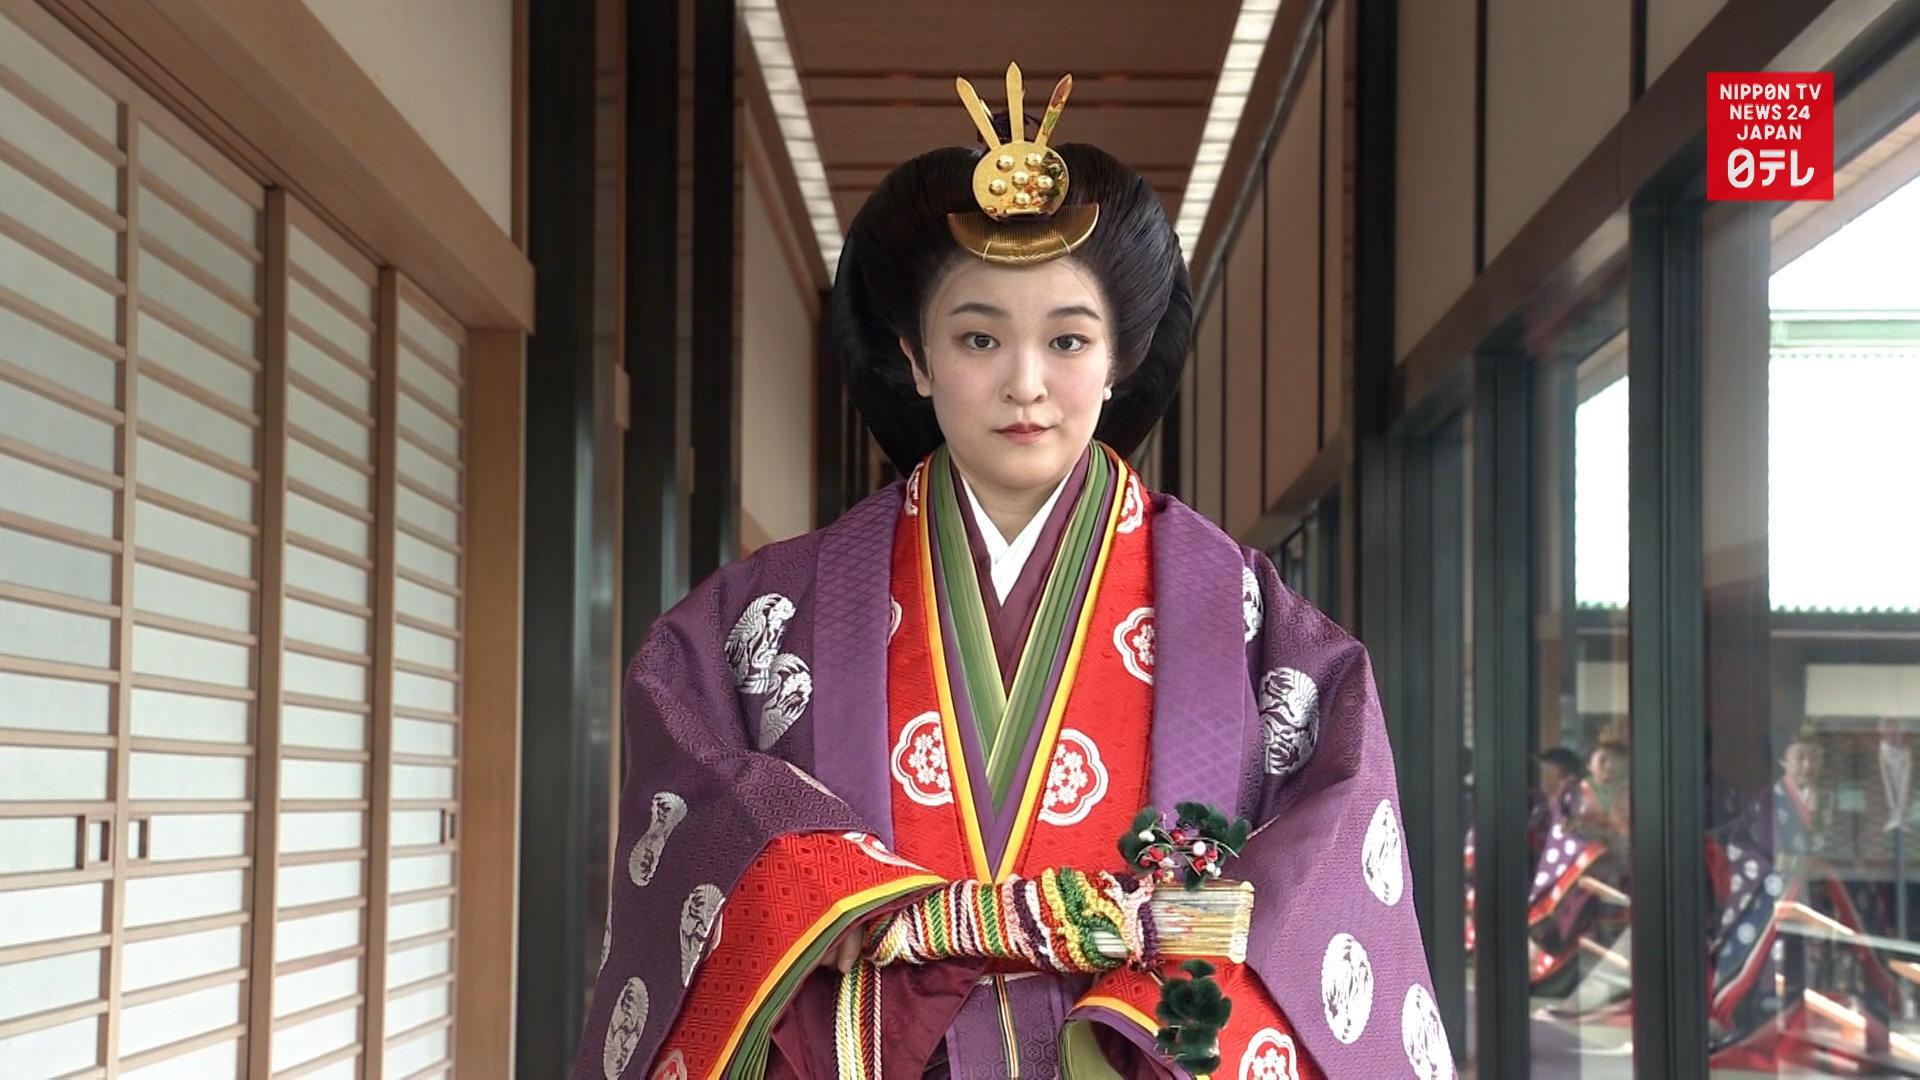 Japan's Princess Mako turns 28